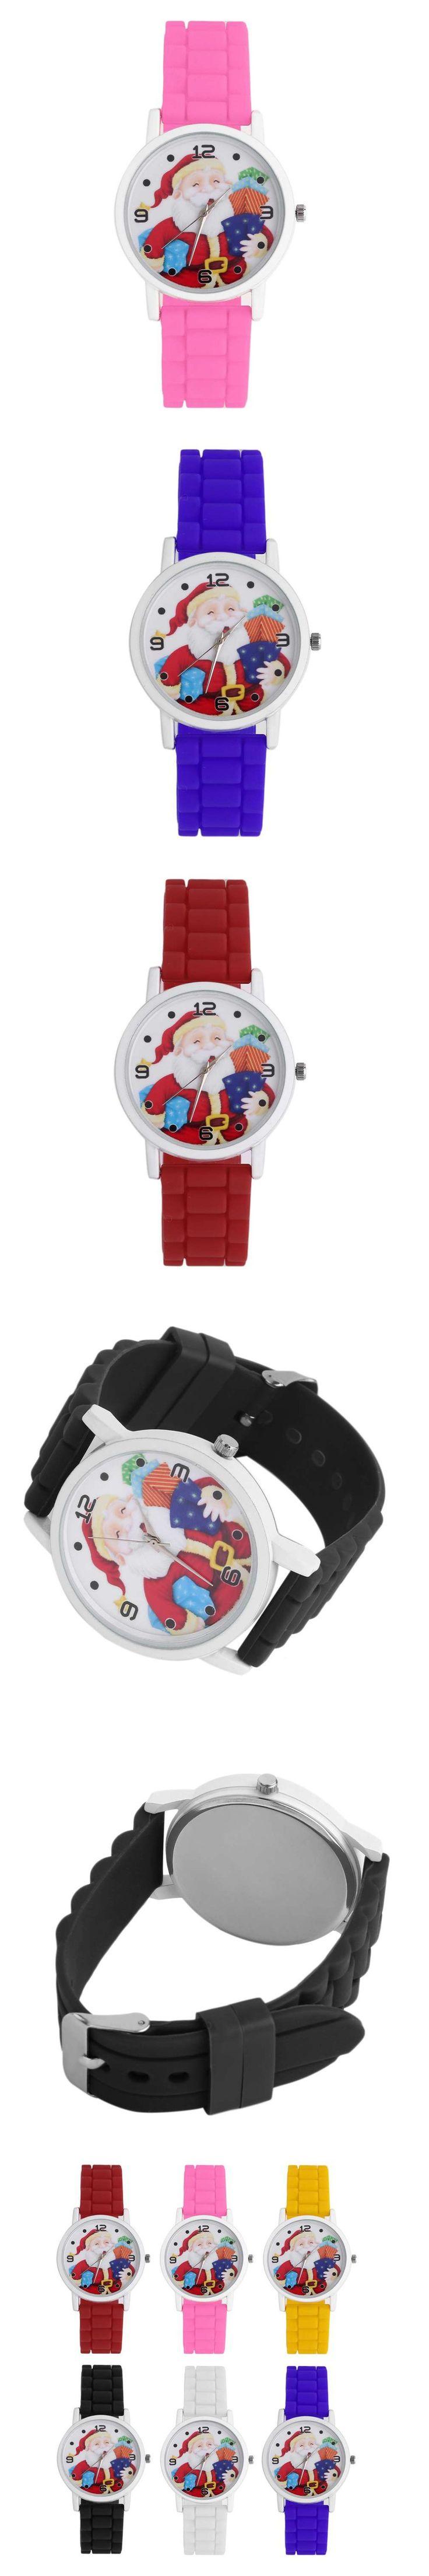 New Arrivals Size 3 Festival Christmas Watch Kids Cute Silica Gel Band Strap Quartz WristWatch Boys Girls Wonderful Gift Watch $2.65